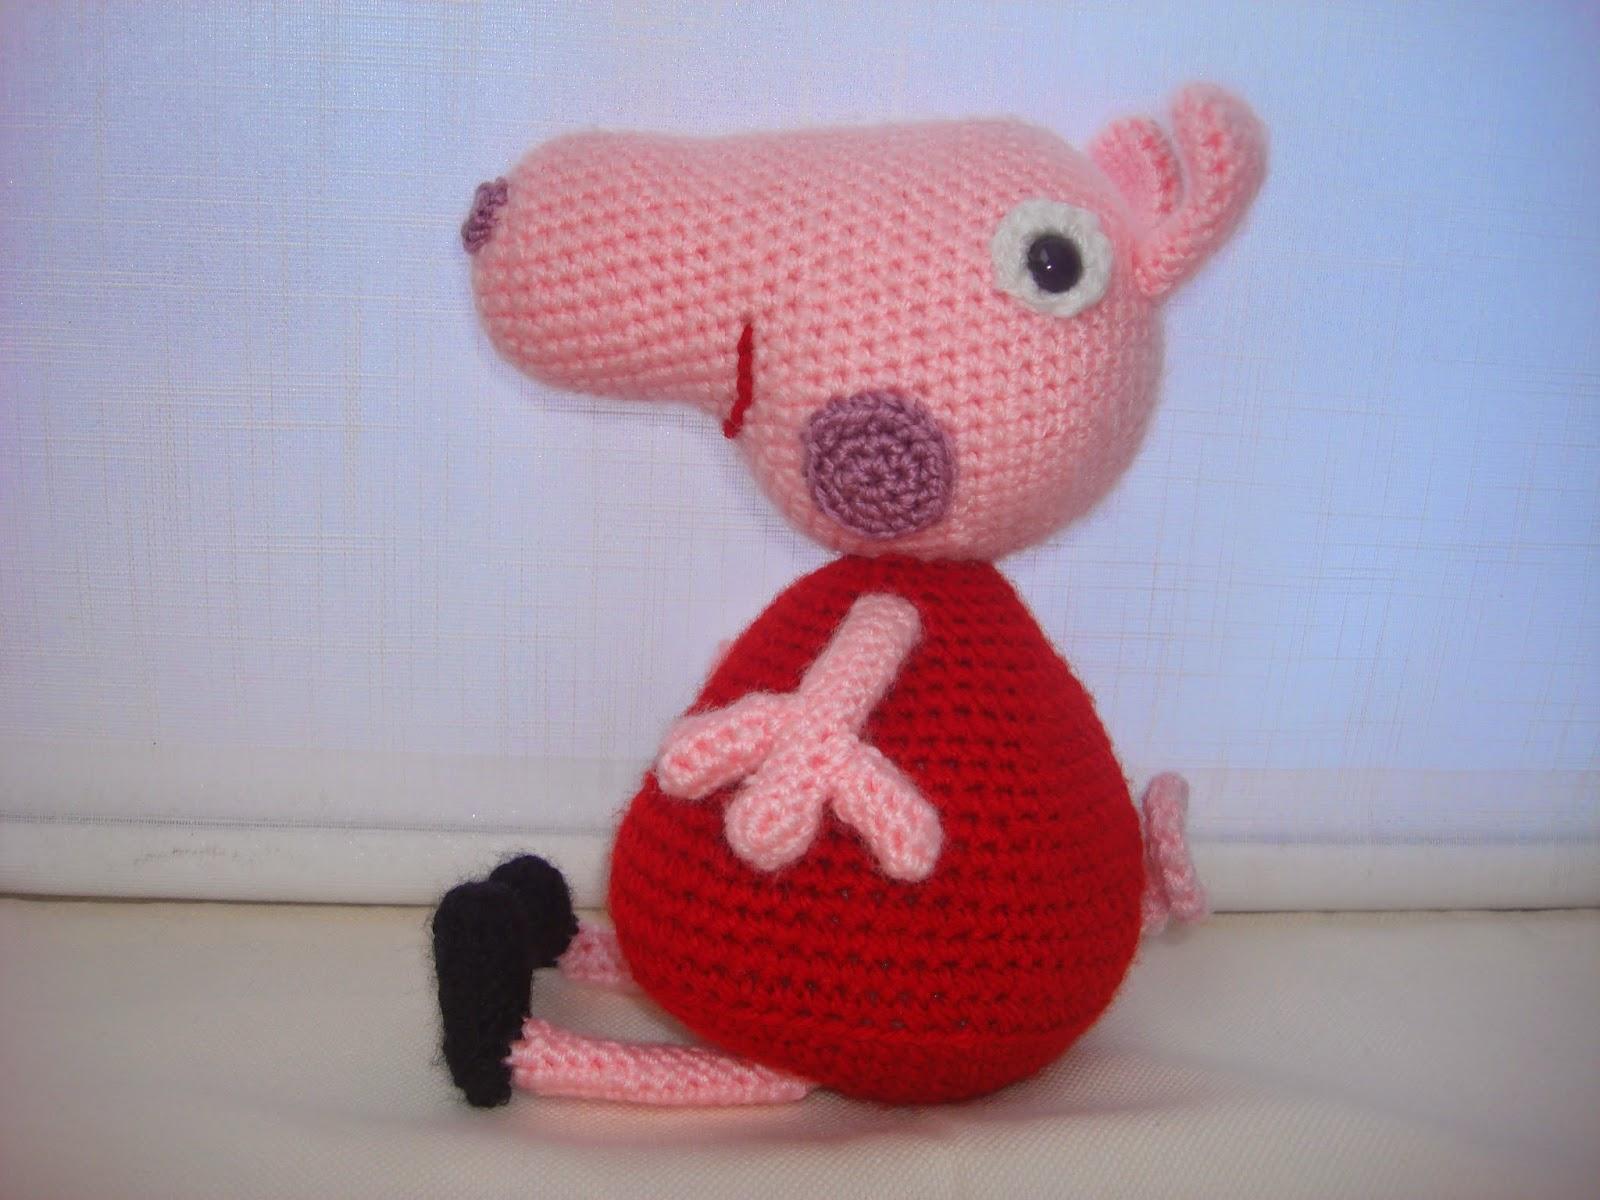 Amigurumi Peppa Pig Mini : CANAL CROCHET: peppa pig amigurumi